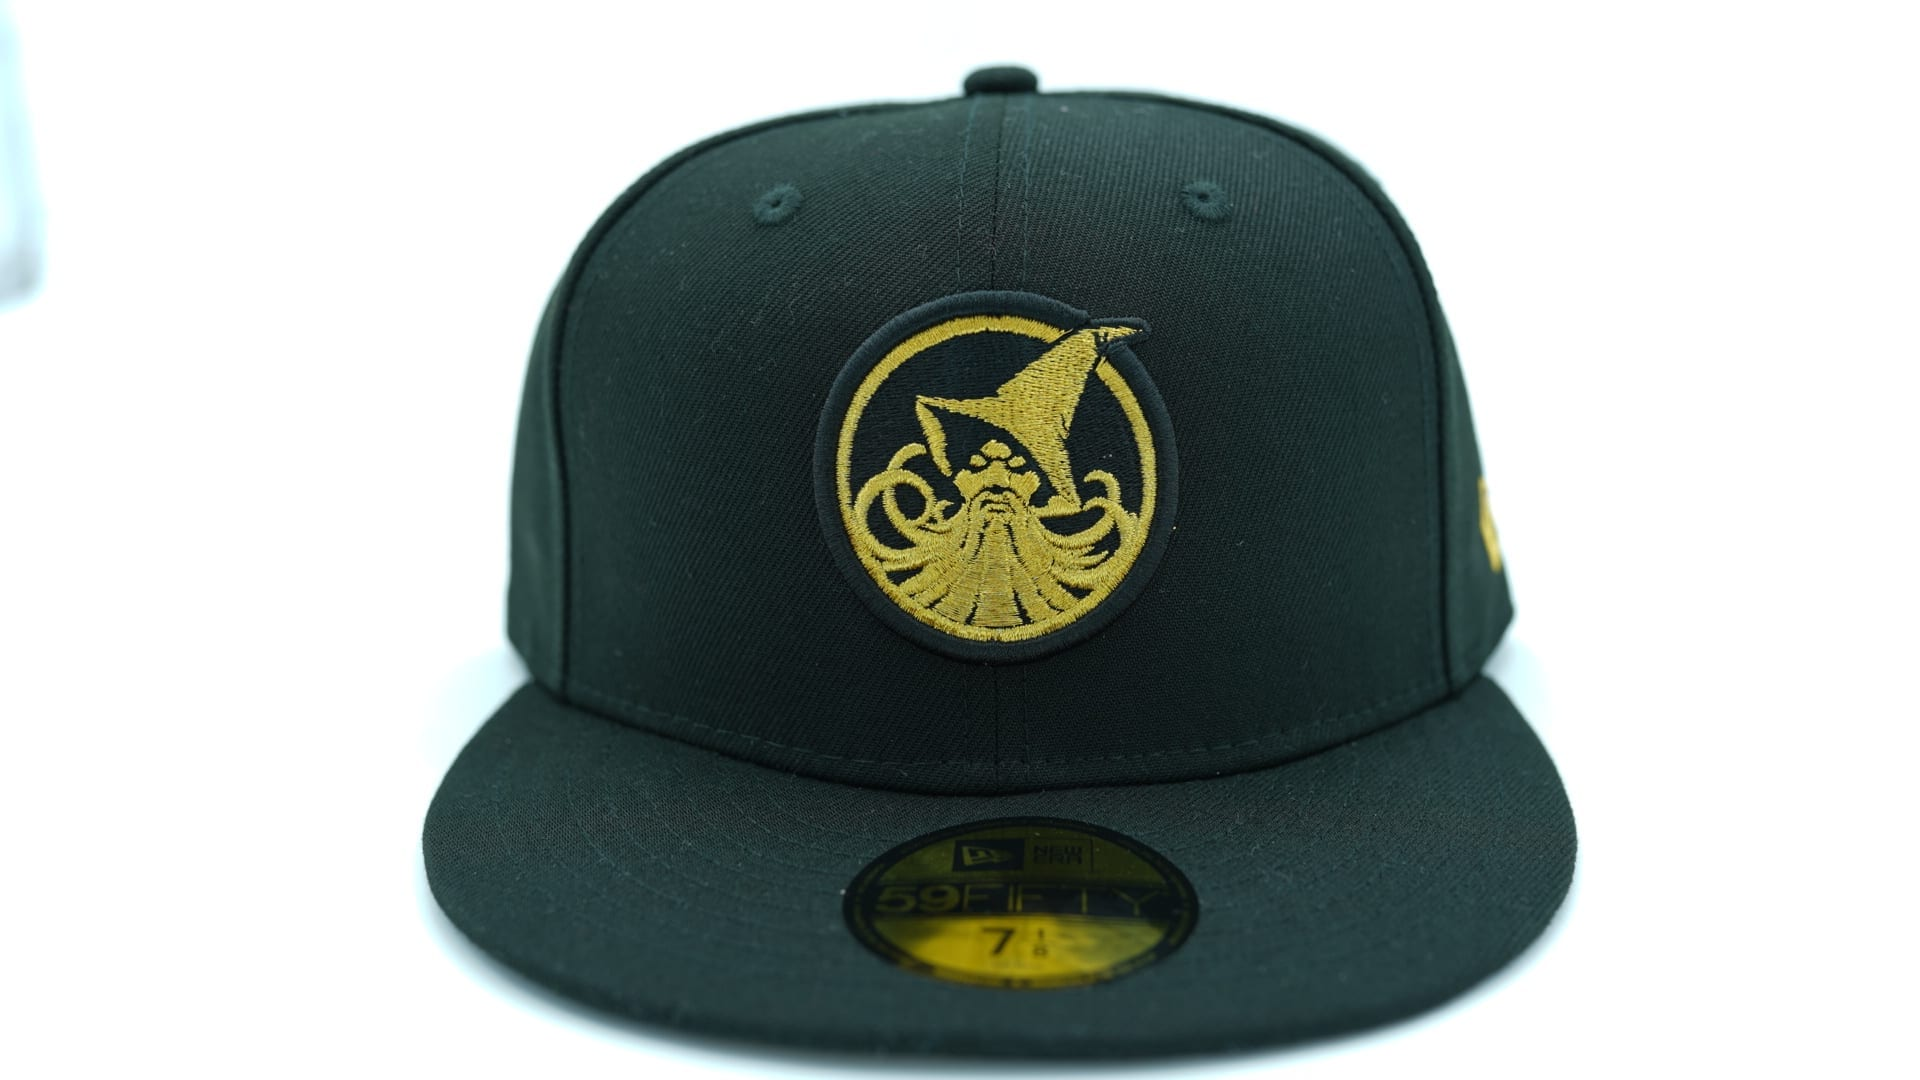 jai-cruz-fitted-baseball-cap-new-era_1